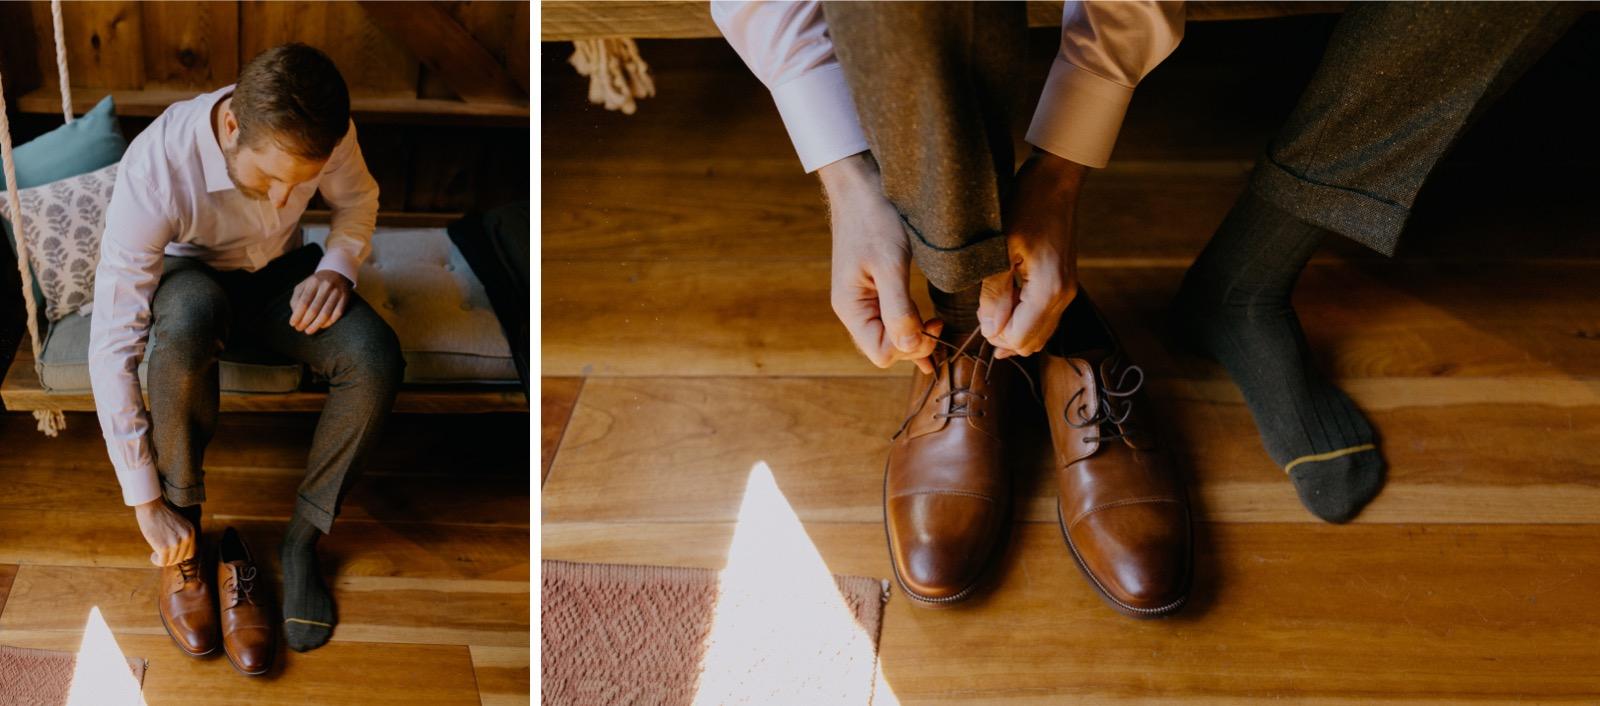 005_Emily & Jeff Wedding 0033_Emily & Jeff Wedding 0032_cabin_groom_wedding_getting-ready